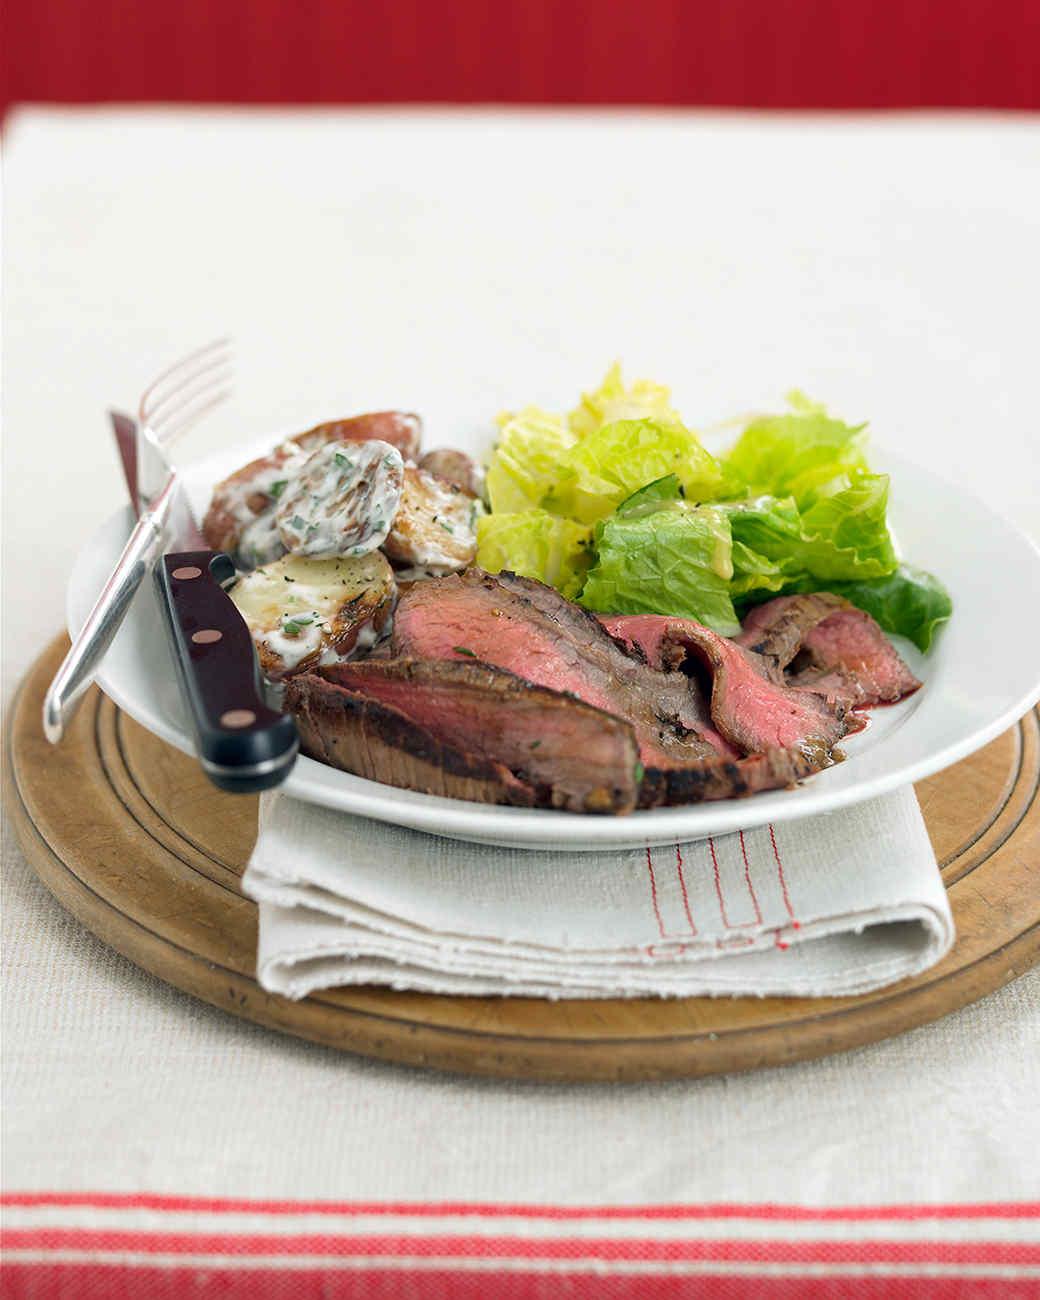 Grilled Steak with Potato Salad